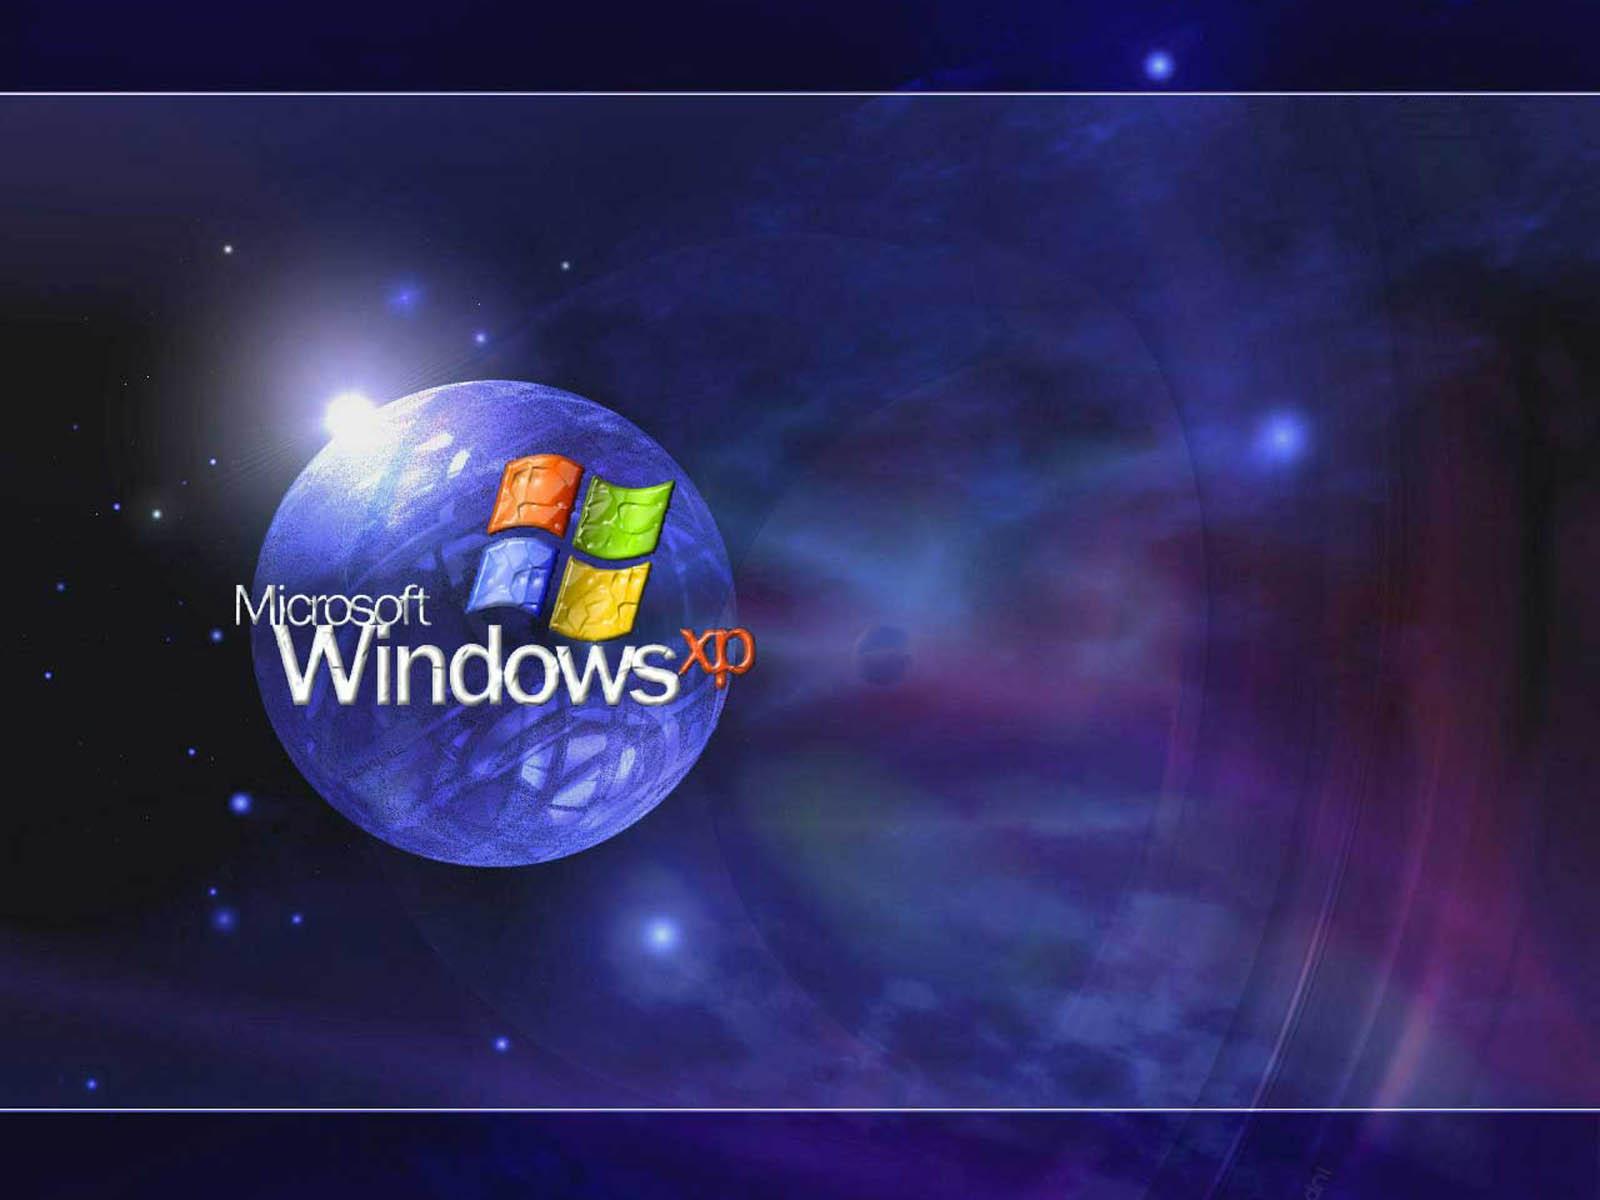 Wallpapers Windows XP 1600x1200